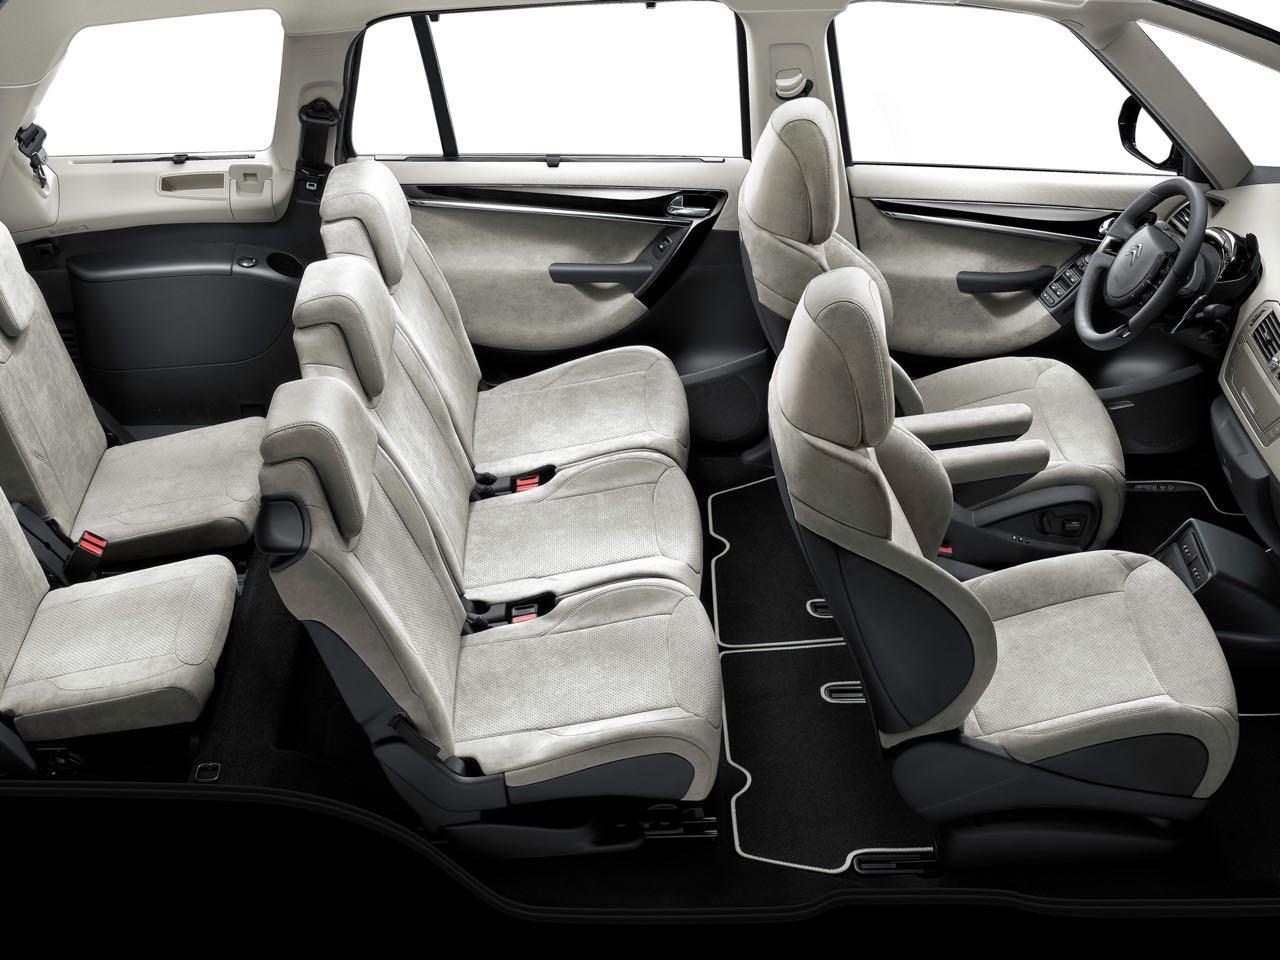 Citro n c4 grand picasso 2011 precios motores equipamientos - Citroen c4 grand picasso interior ...